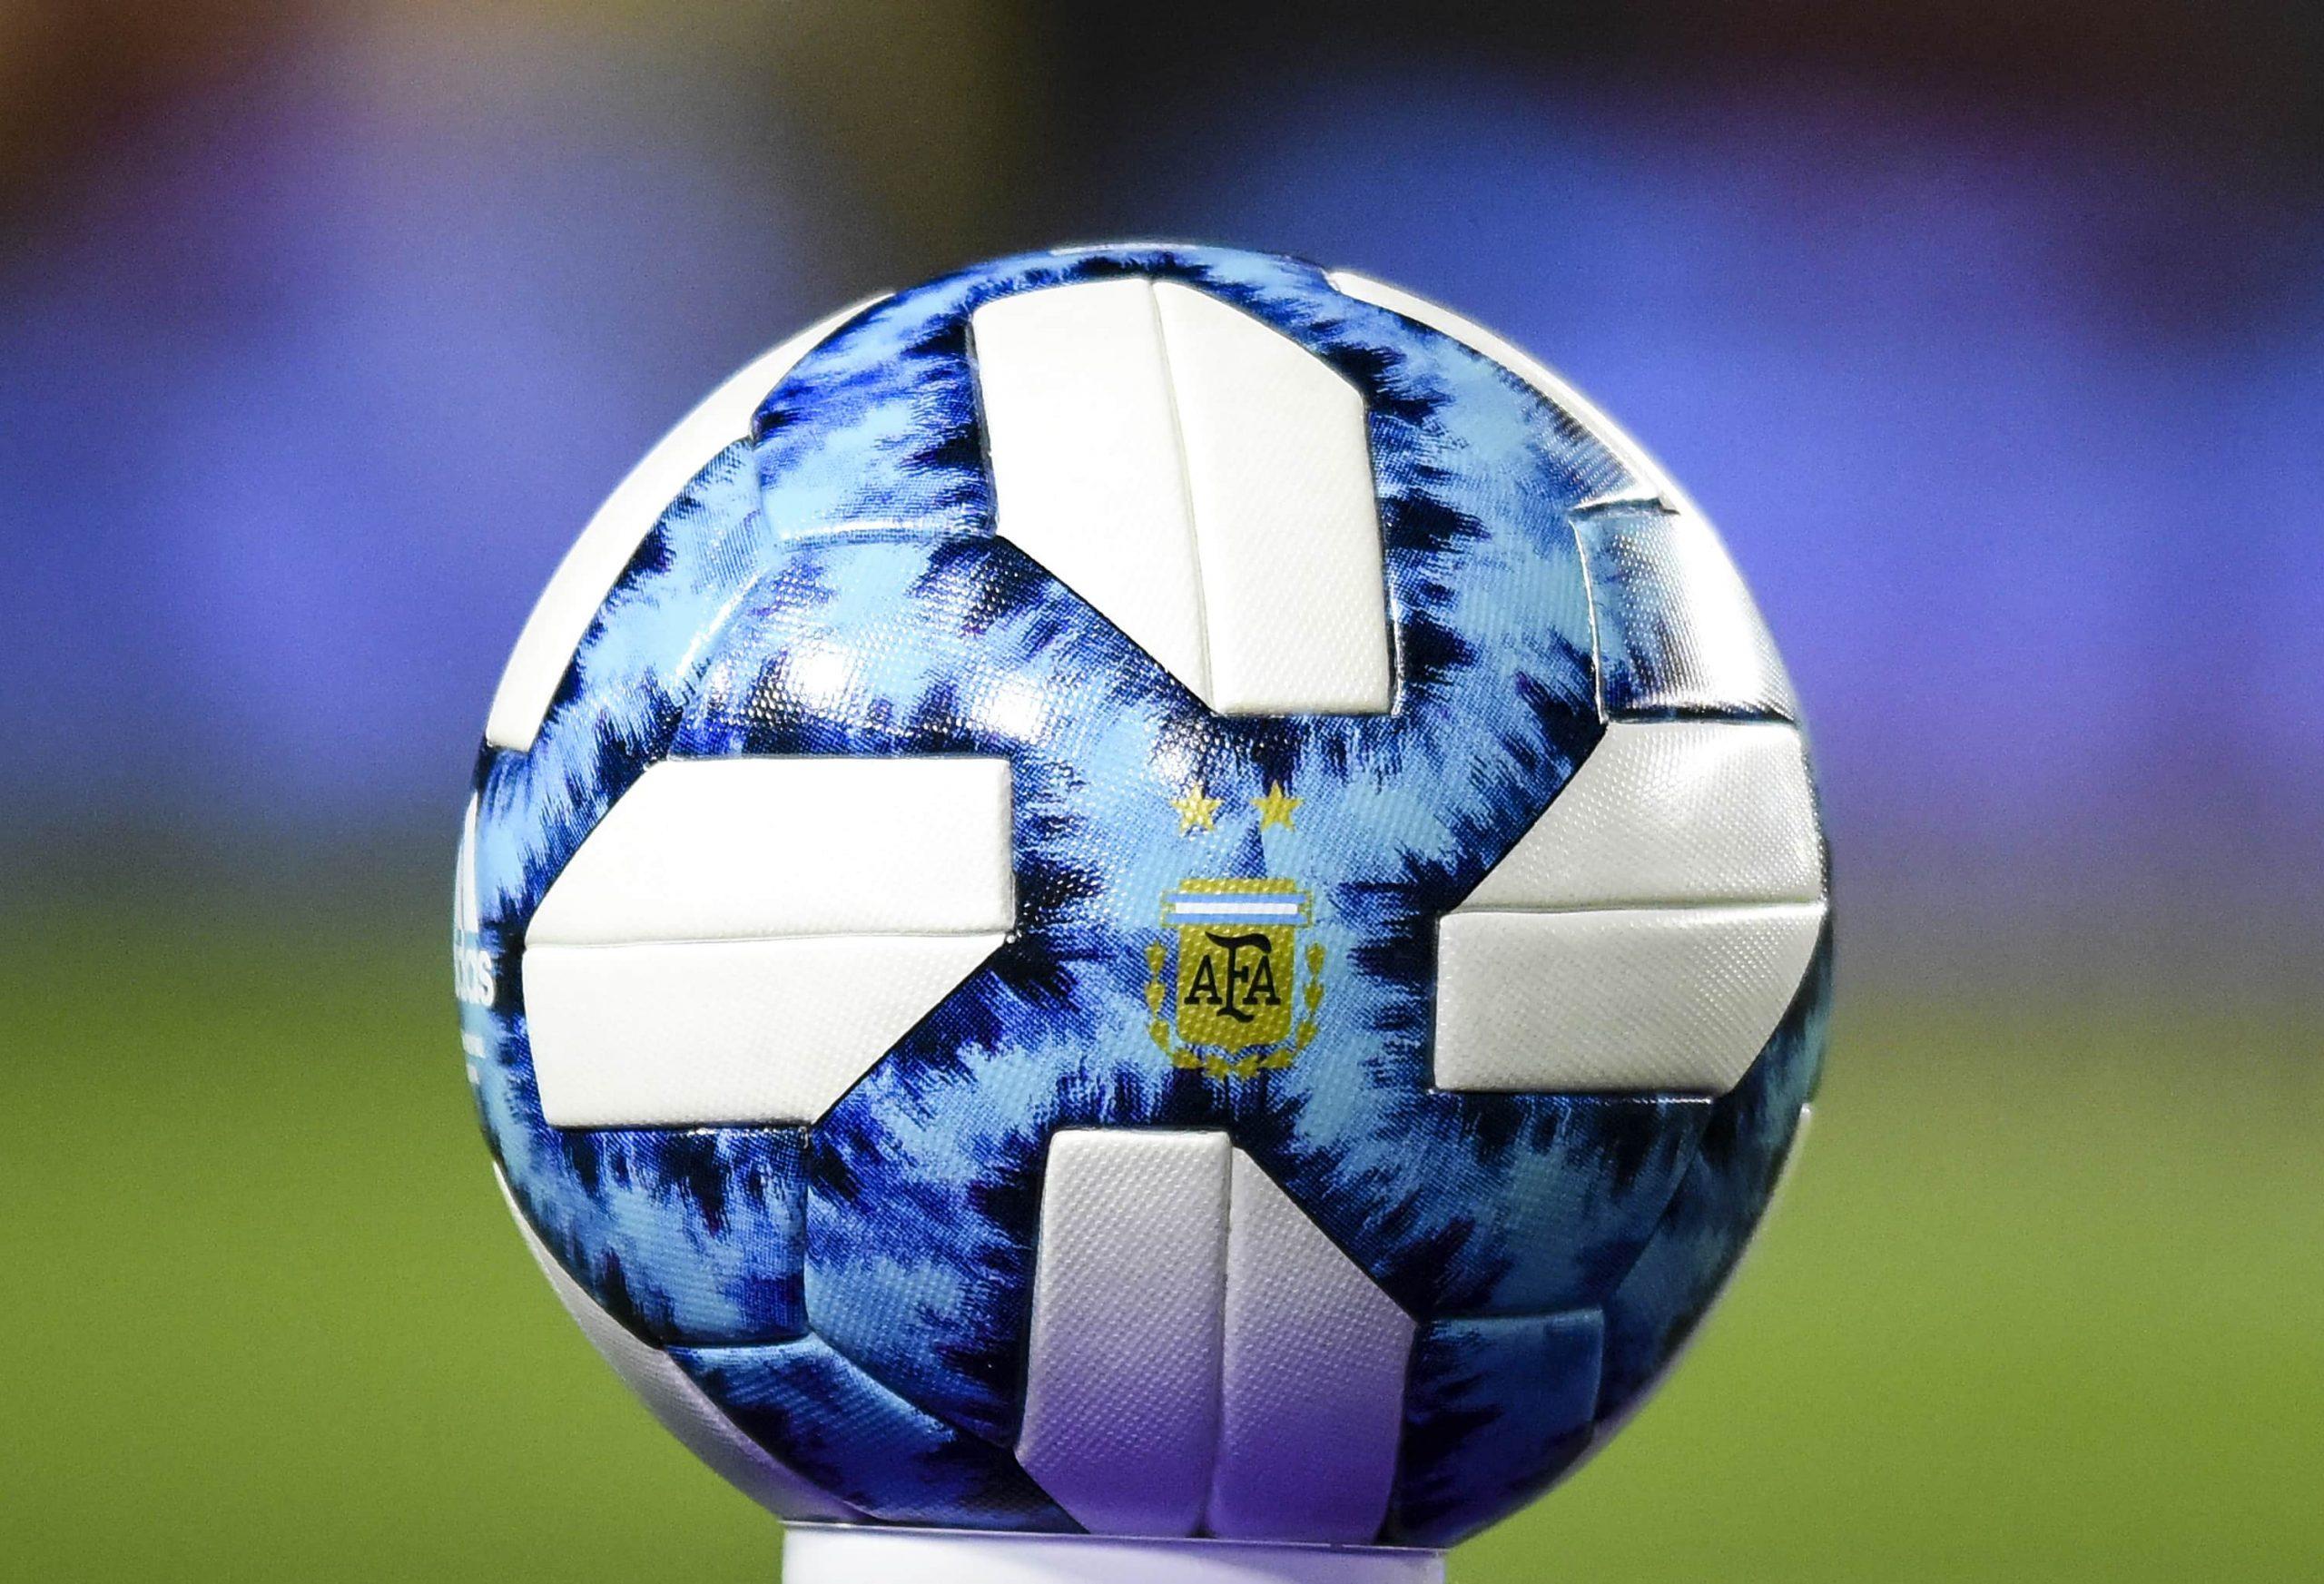 Arranca la Liga Profesional de Fútbol